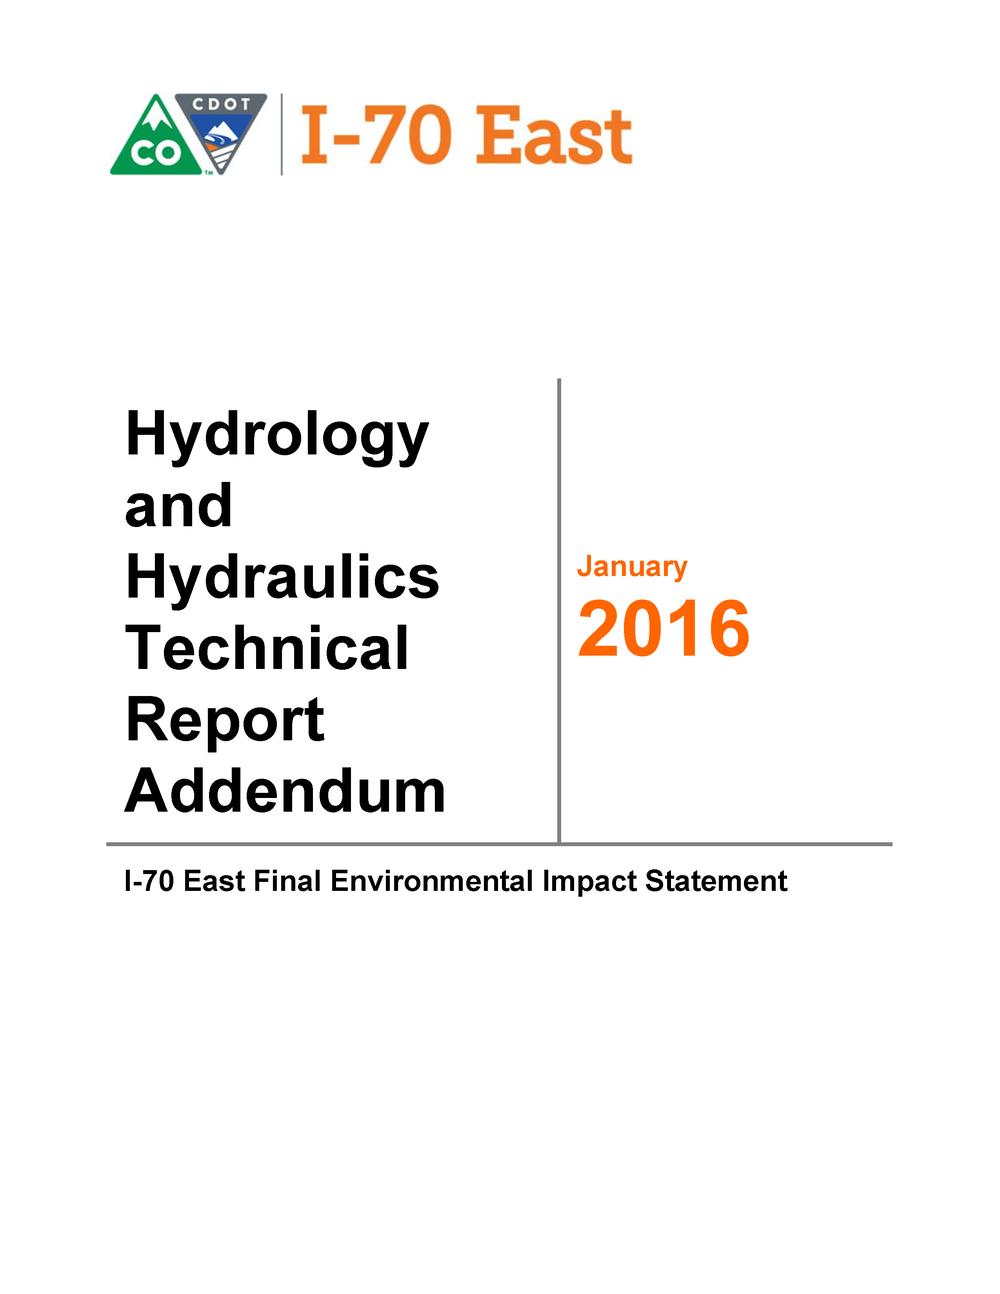 Hydrology & Hydraulics Report Addendum